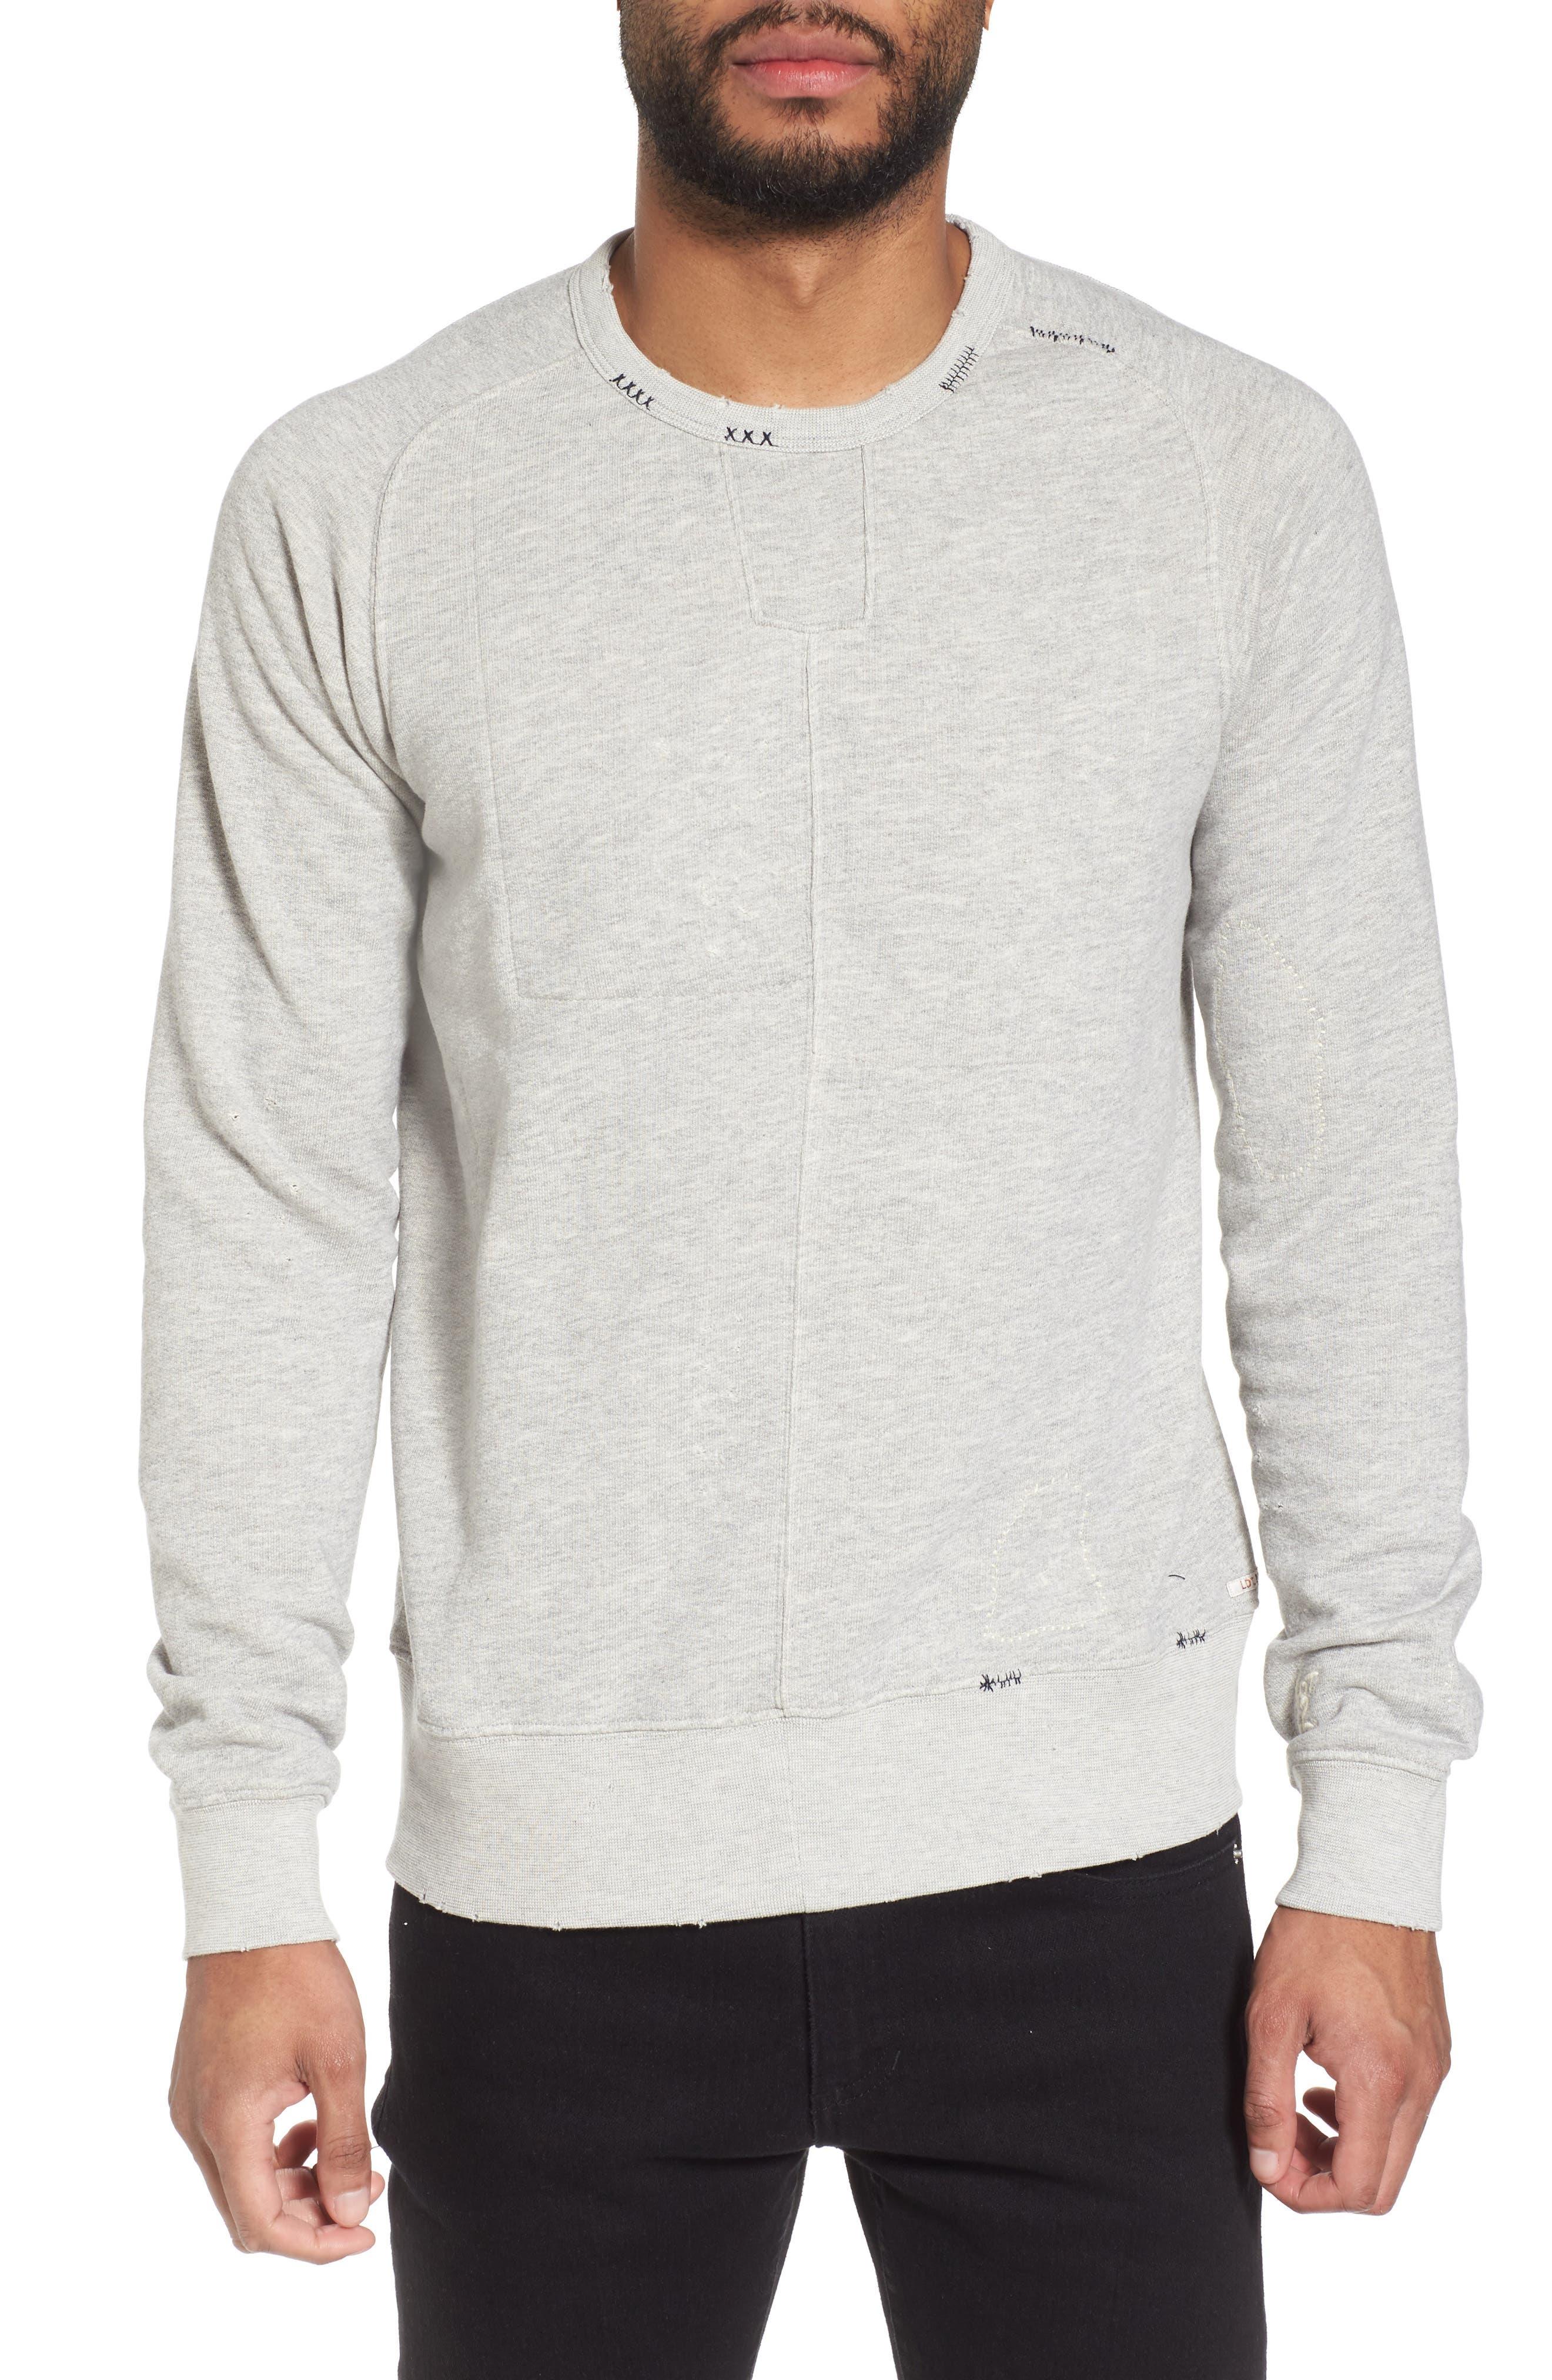 Lot 22 Sweatshirt,                             Main thumbnail 1, color,                             450